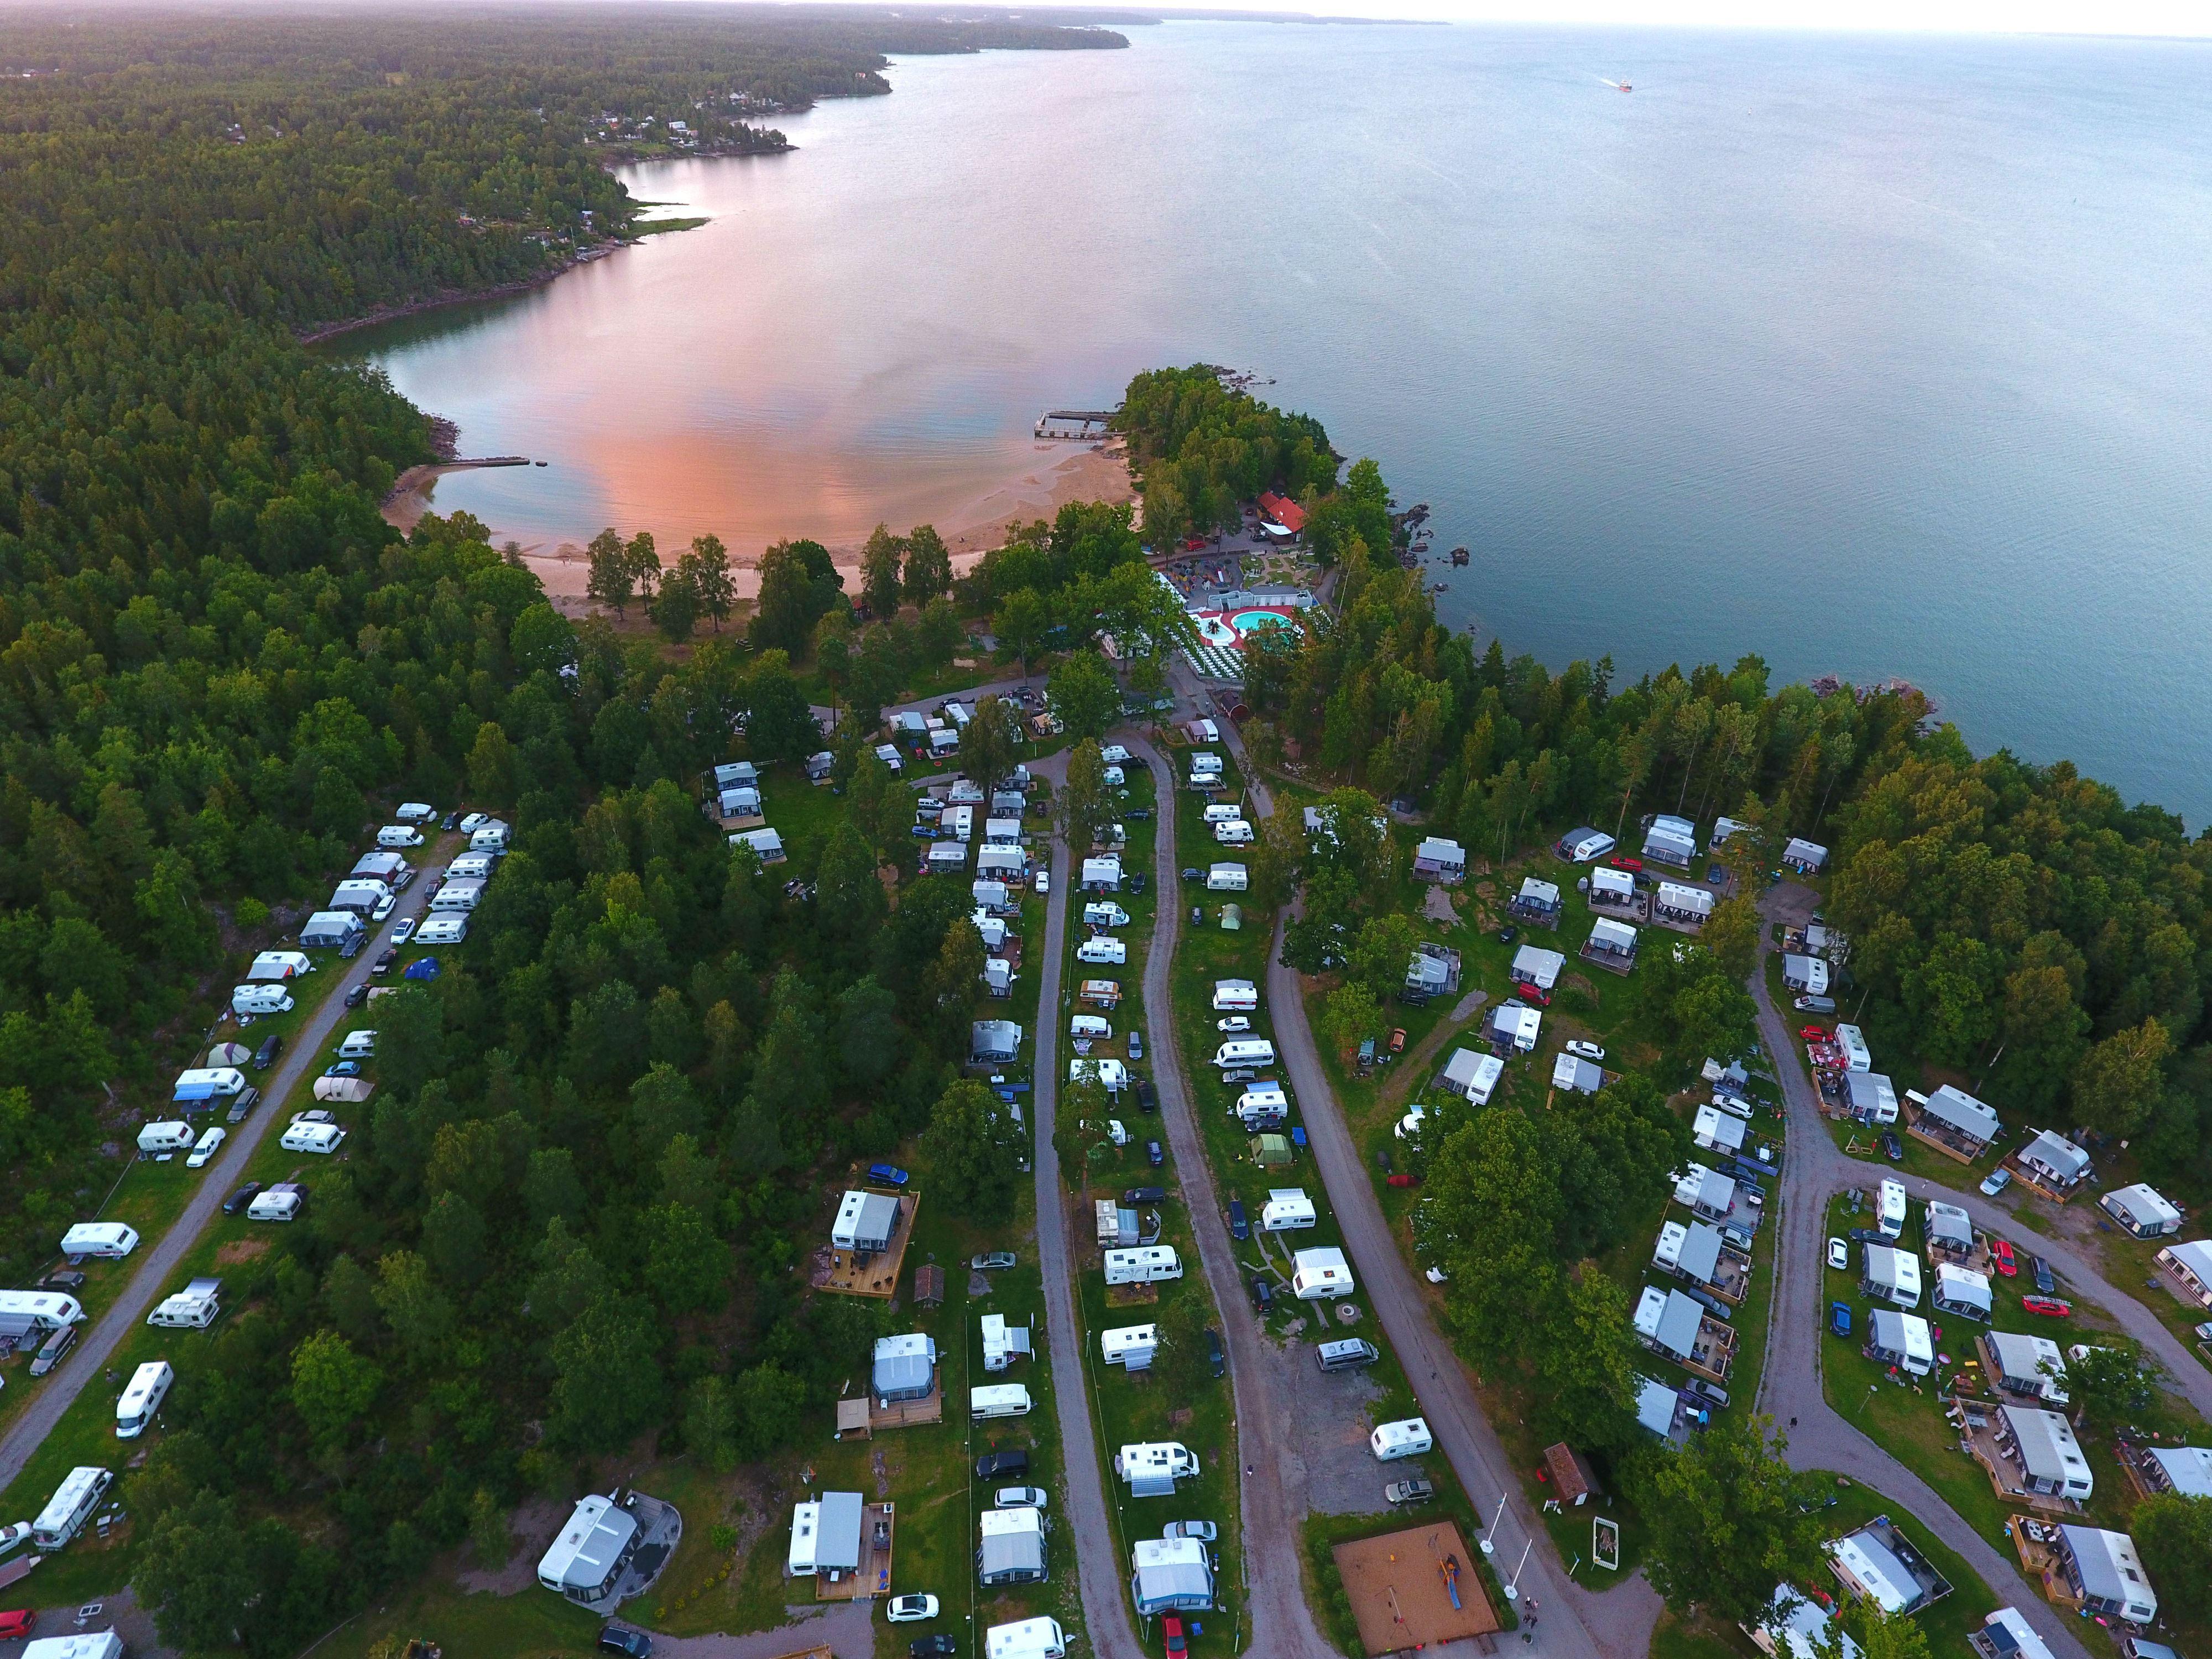 Ursands Camping/Camping